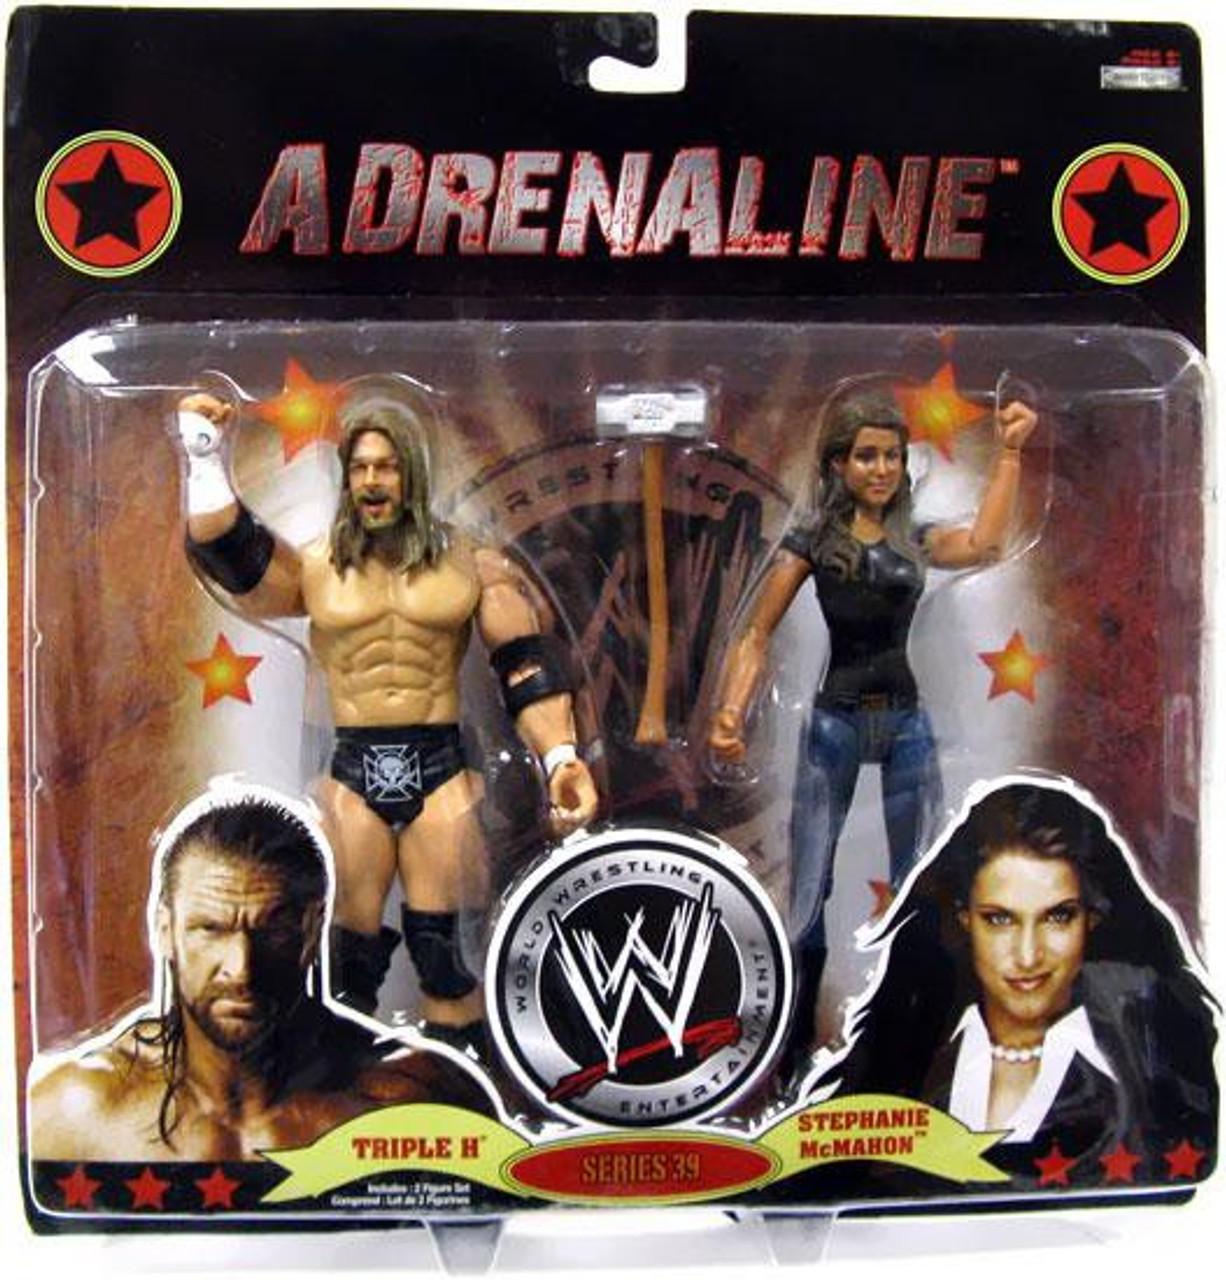 WWE Wrestling Adrenaline Series 39 Triple H & Stephanie McMahon Action Figure 2-Pack